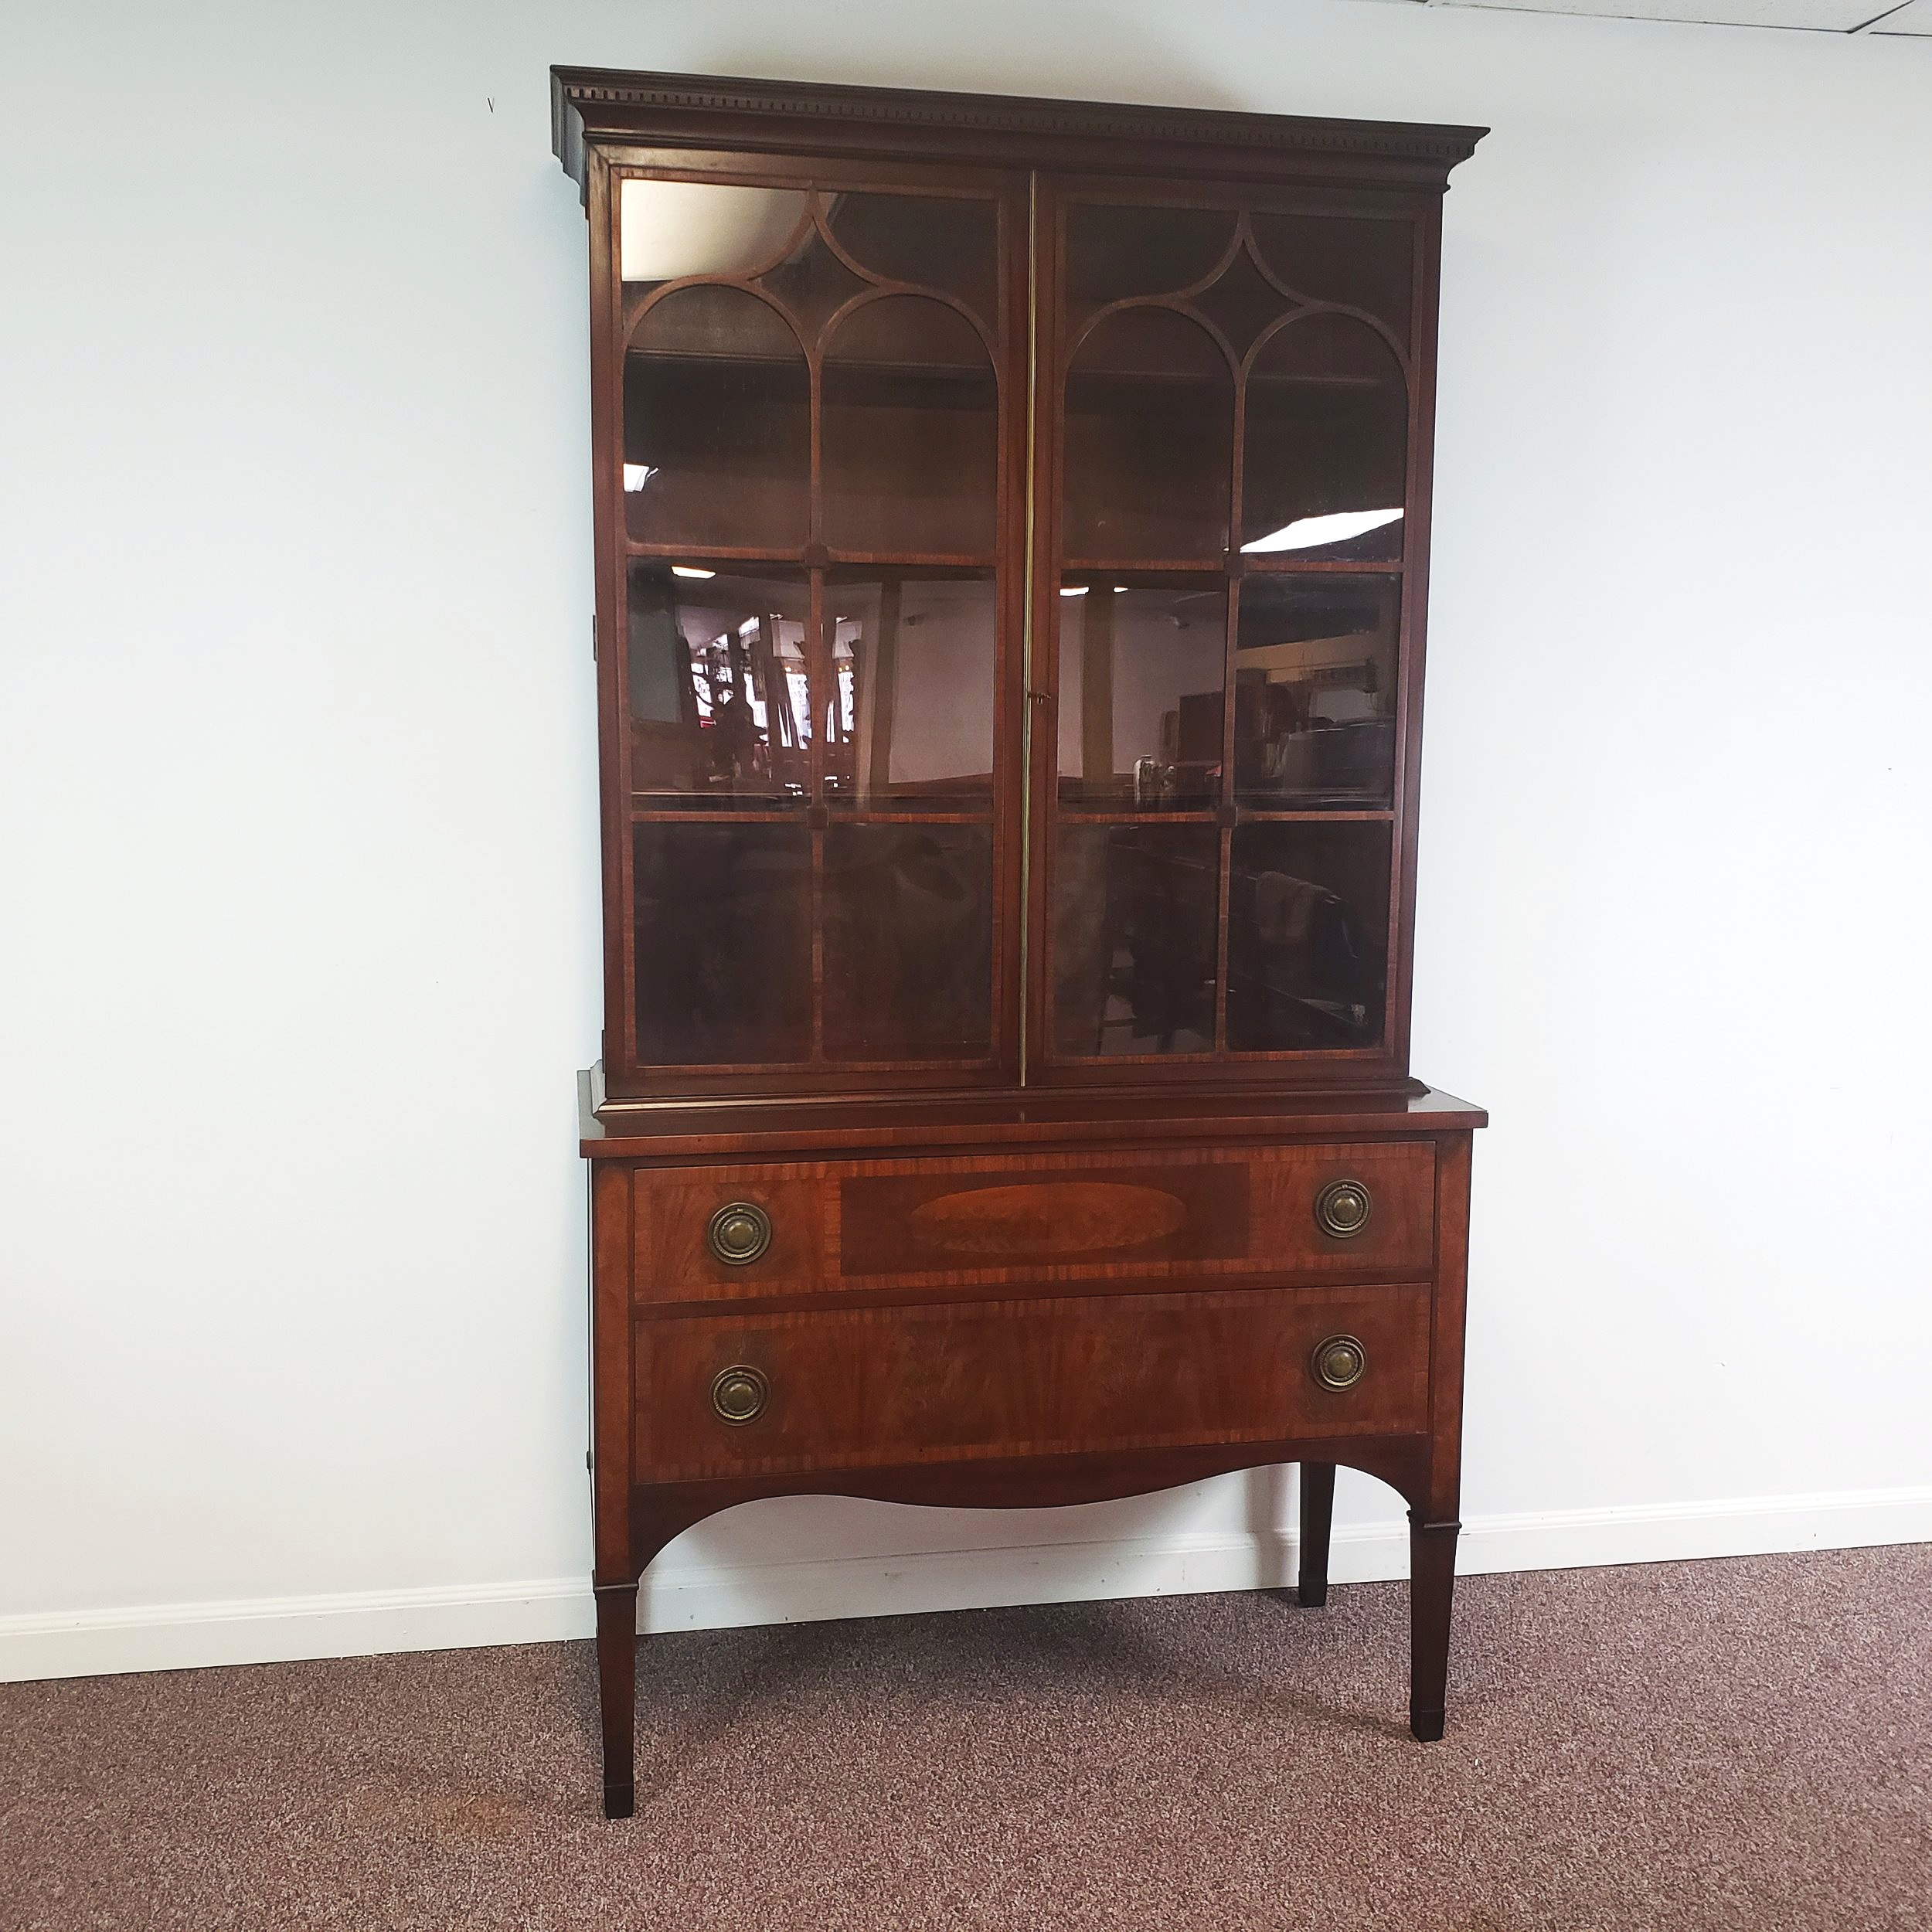 vintage antique 1920s mahogany inlaid china cabinet bookcase hutch rh ardesh com 1920s style china cabinet 1920s walnut china cabinet